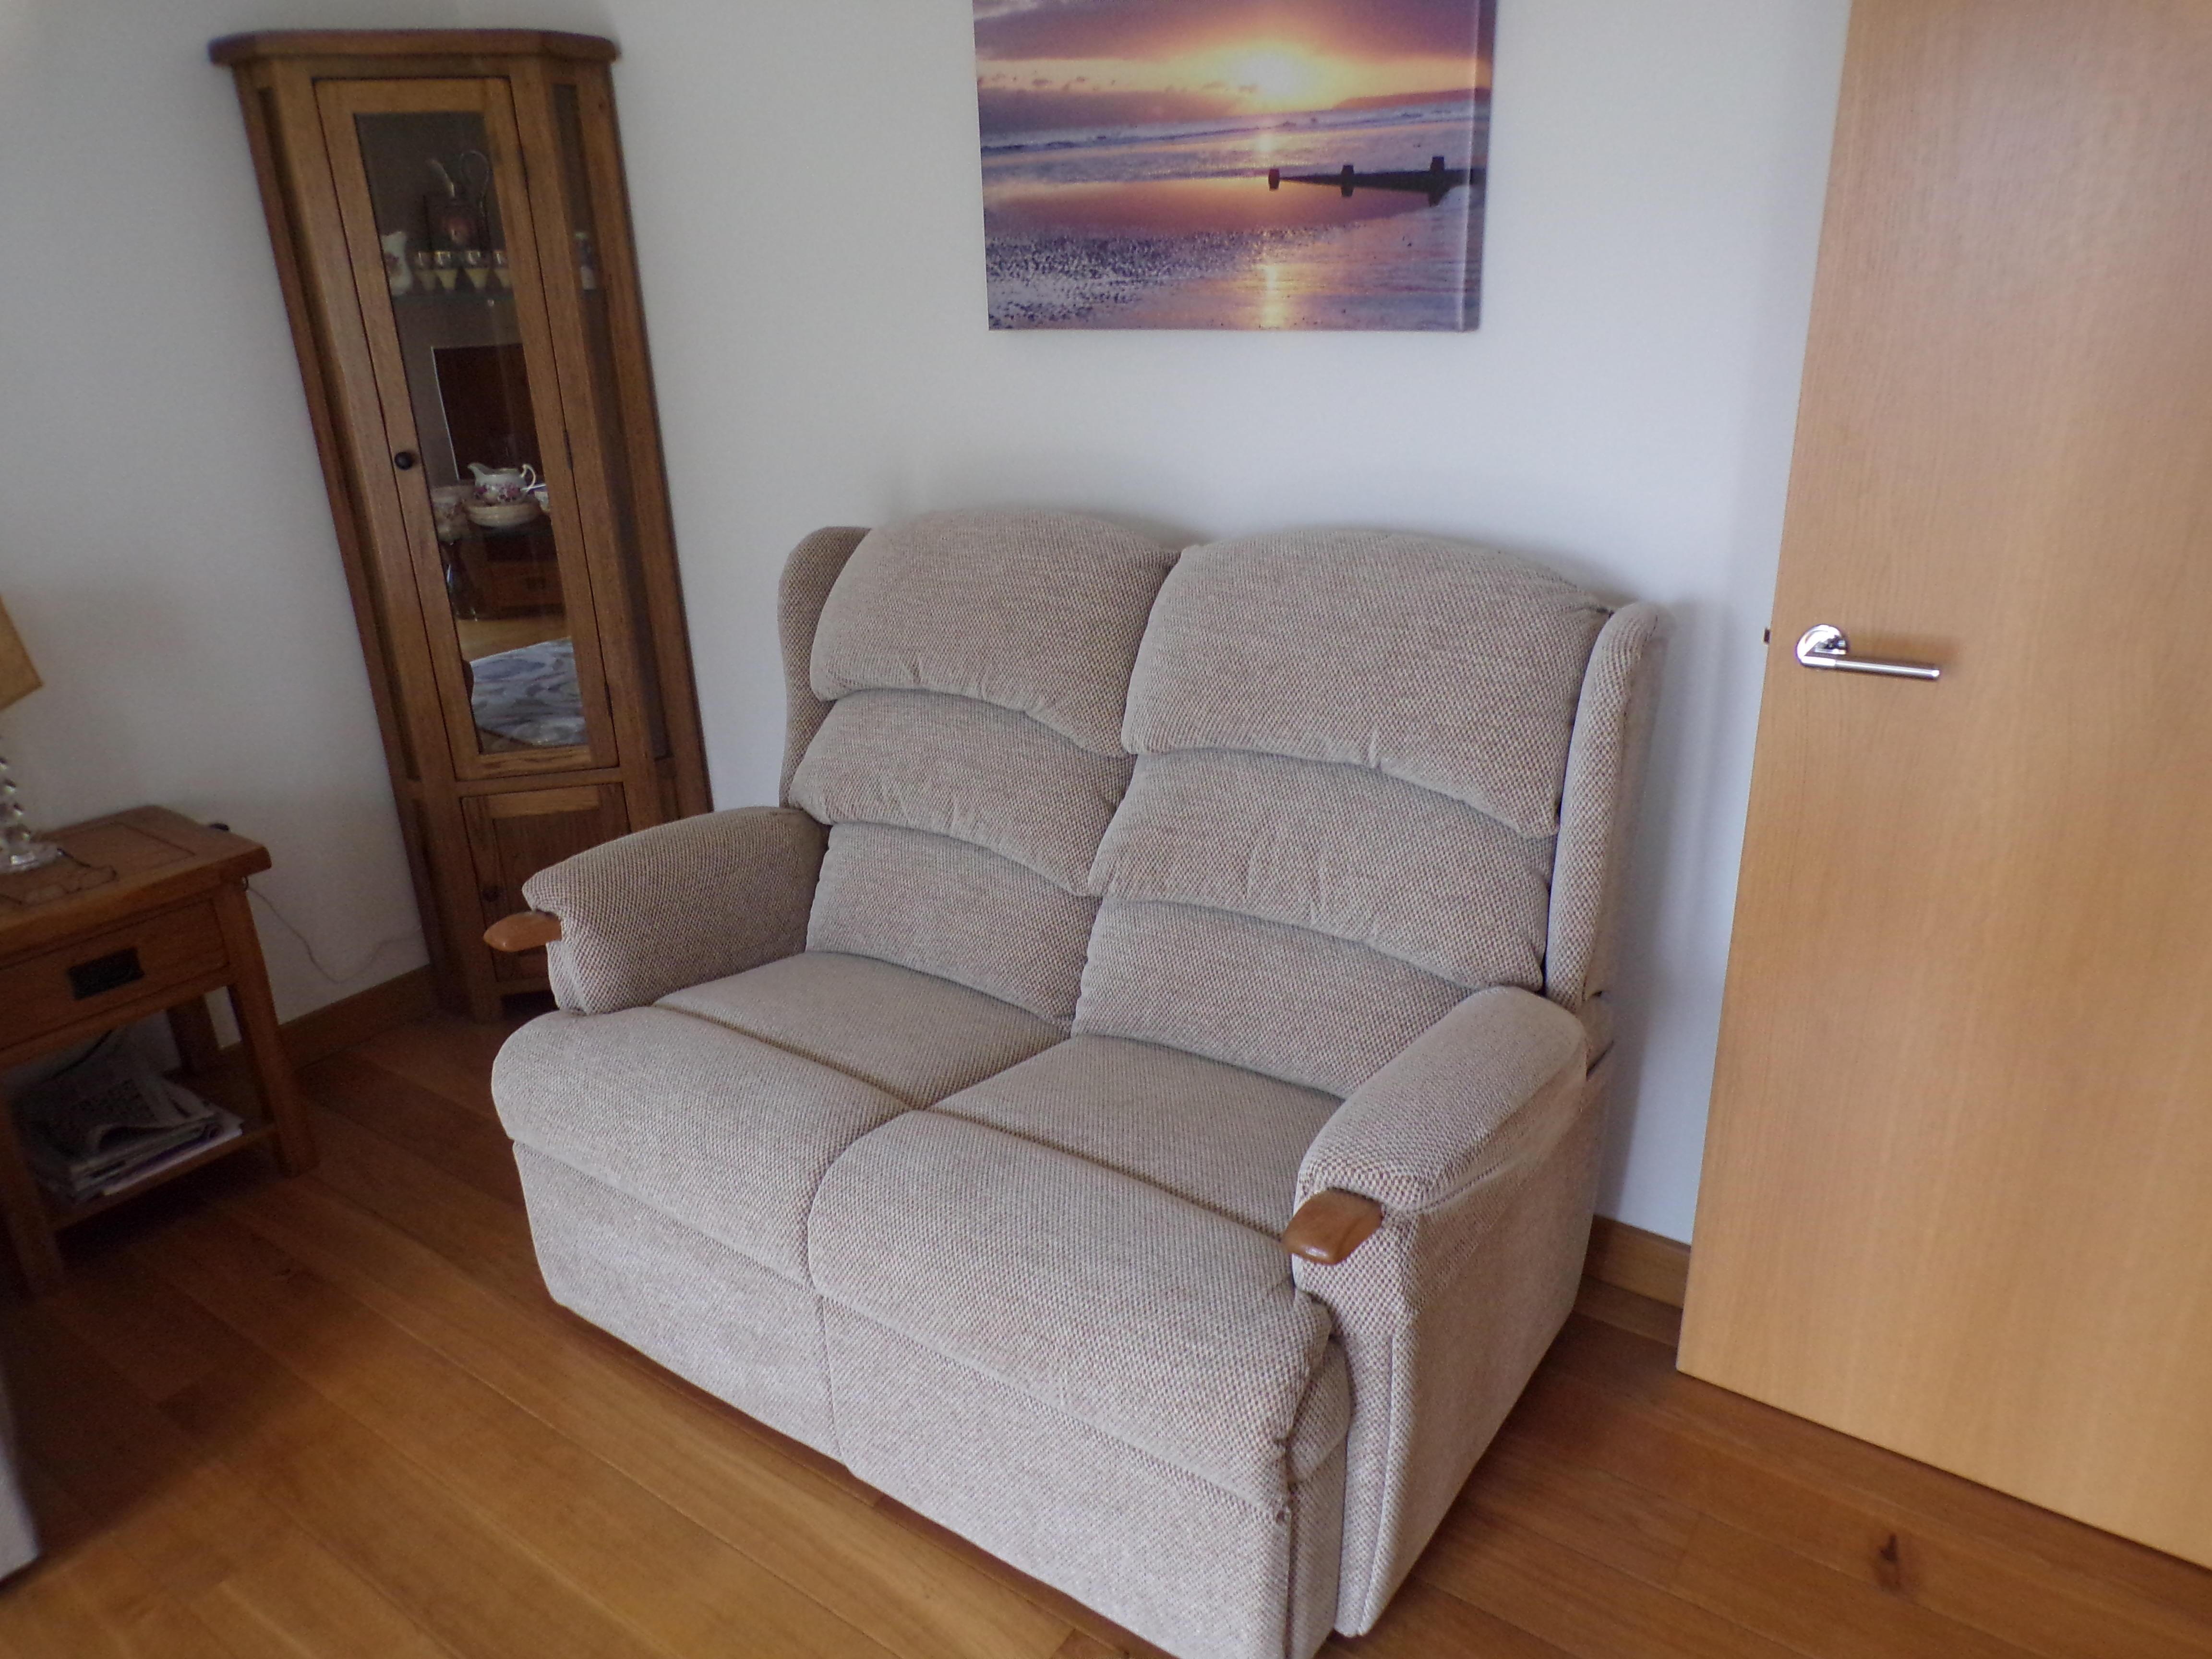 Hsl haydock luxury reclining swivel worthing | Posot Class